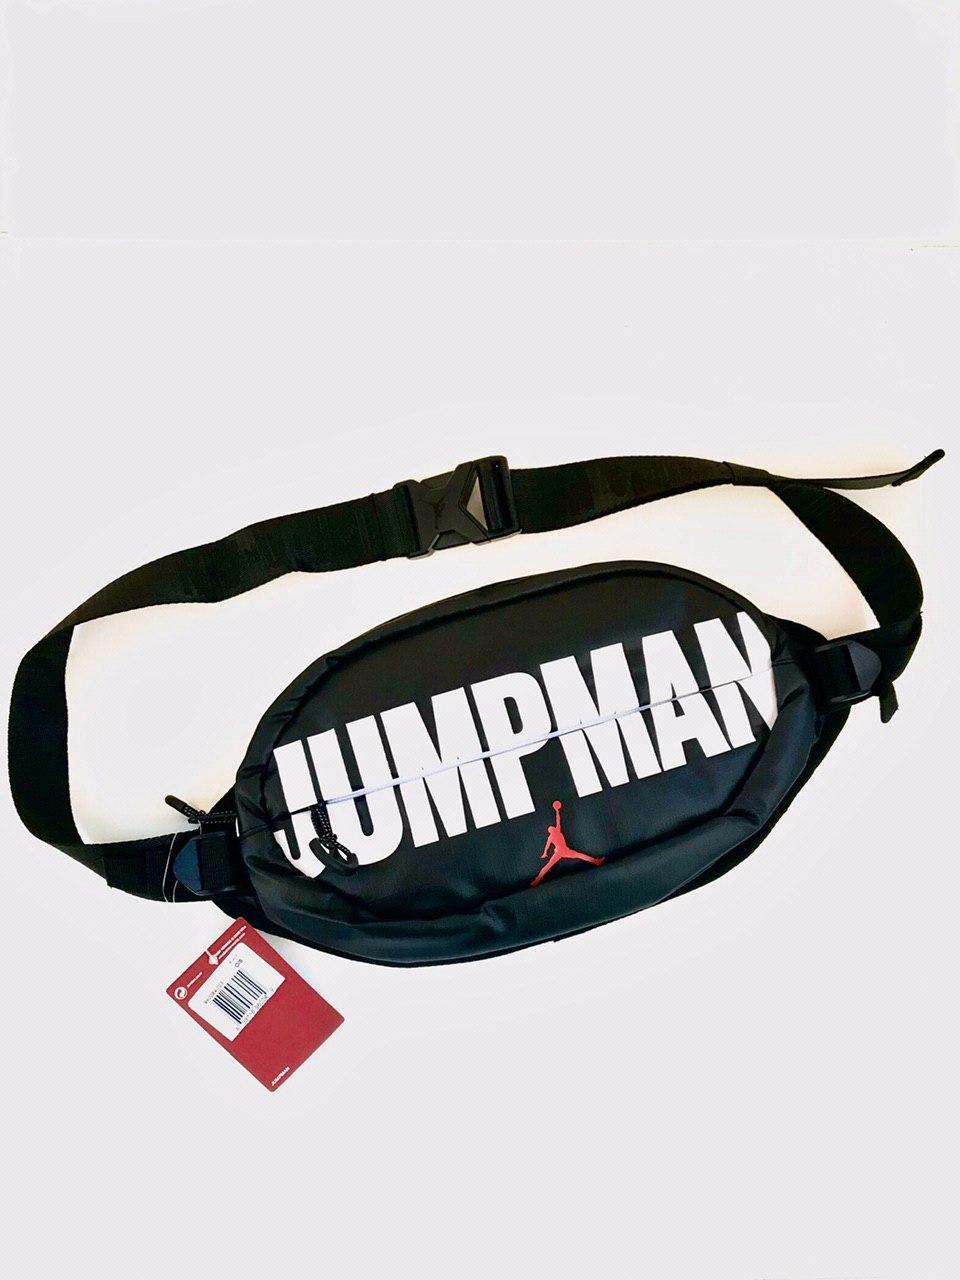 Сумка/Бананка/Органайзер Air Jordan Jumpman Nike Новый Оригинал